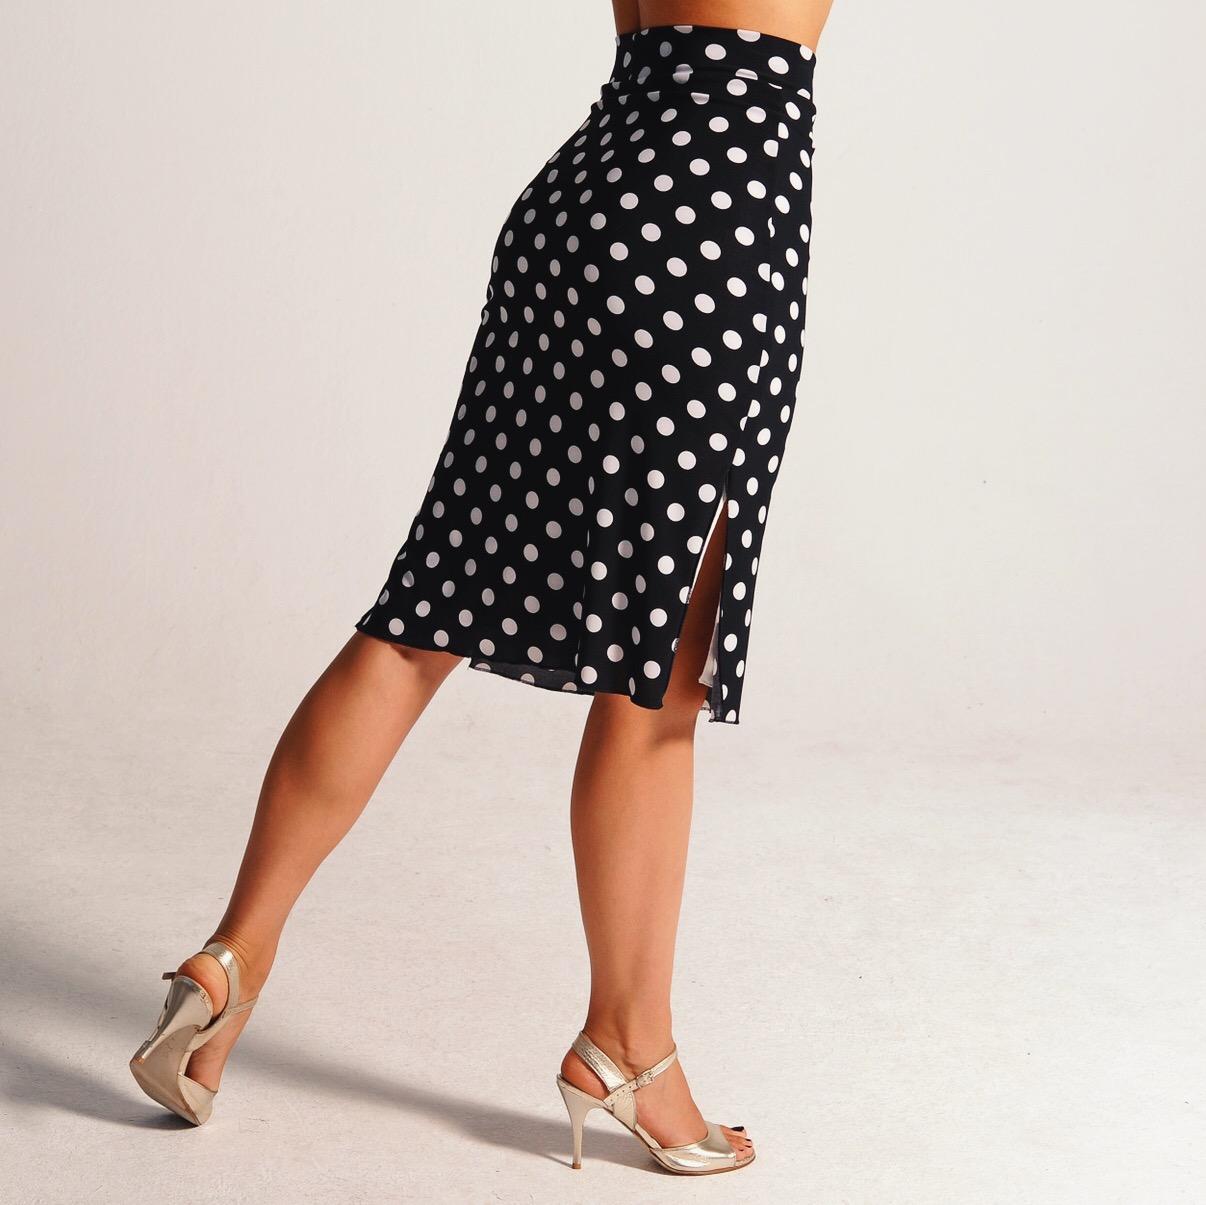 tango_skirt_polka_dot_coleccionberlin.JPG